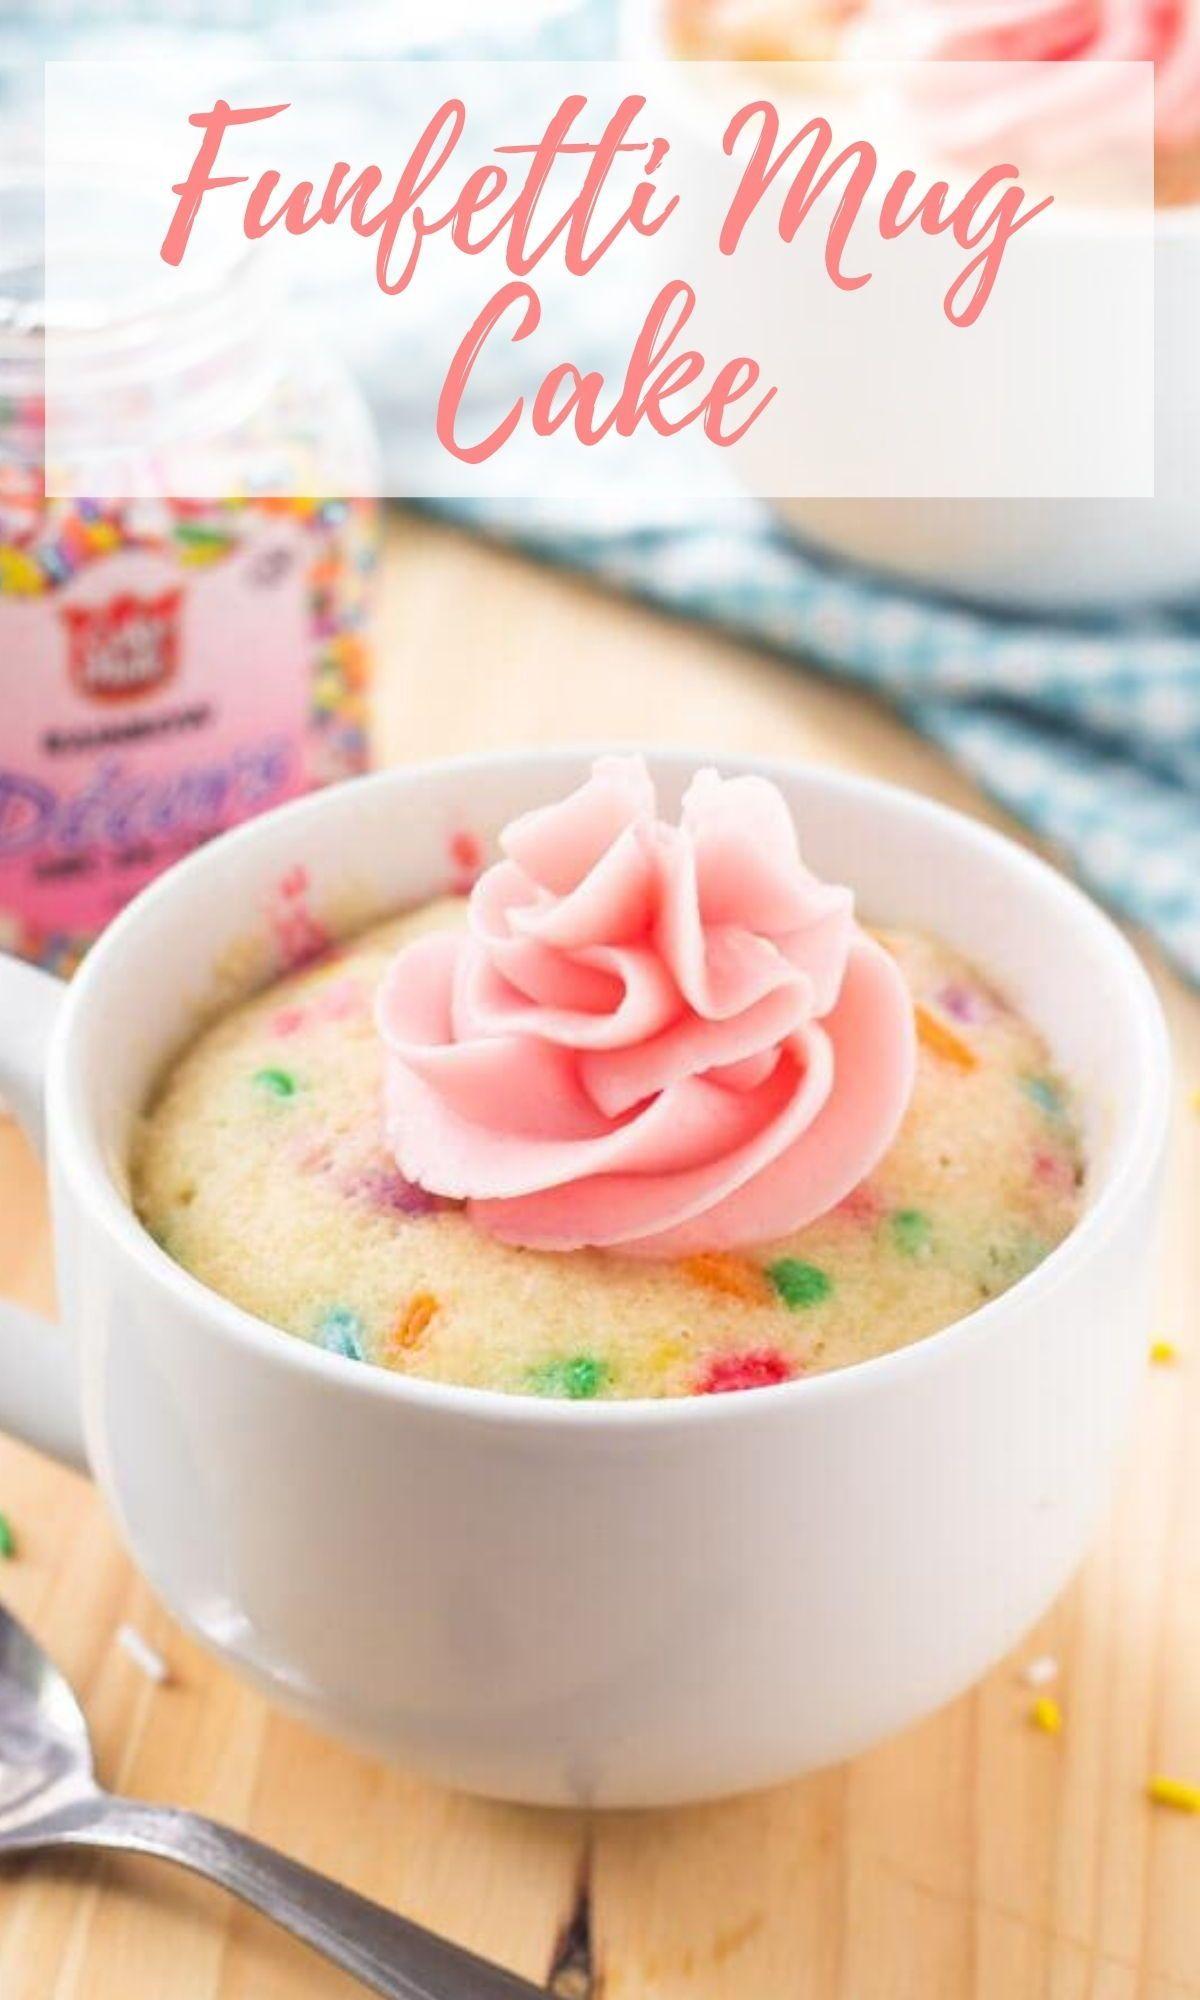 Vanilla Mug Cake Moist Flavorful Cake That S Ready In Minutes Recipe Vanilla Mug Cakes Microwave Mug Recipes Mug Recipes